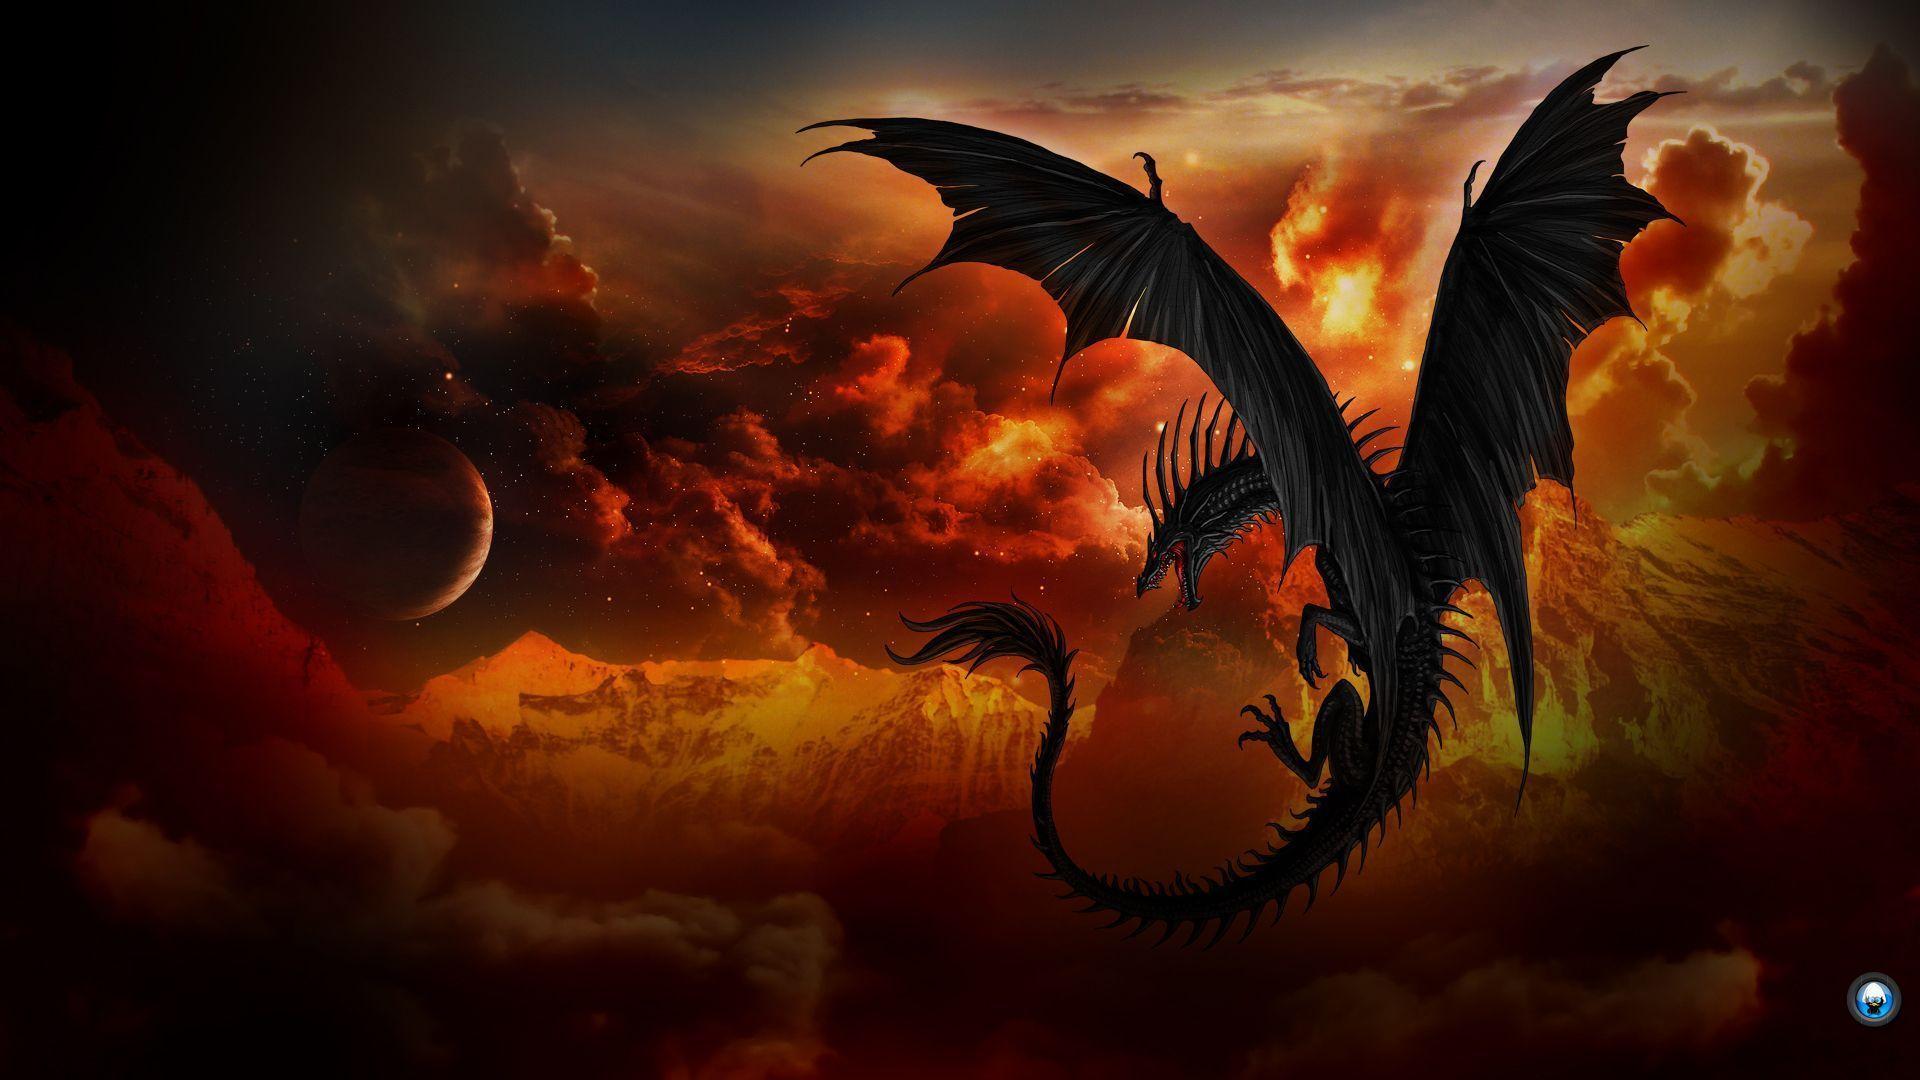 Cool 3d Dragon Wallpapers A L Galleries 1222x763 Px Fantasy Demon Blue Demon Dark Evil